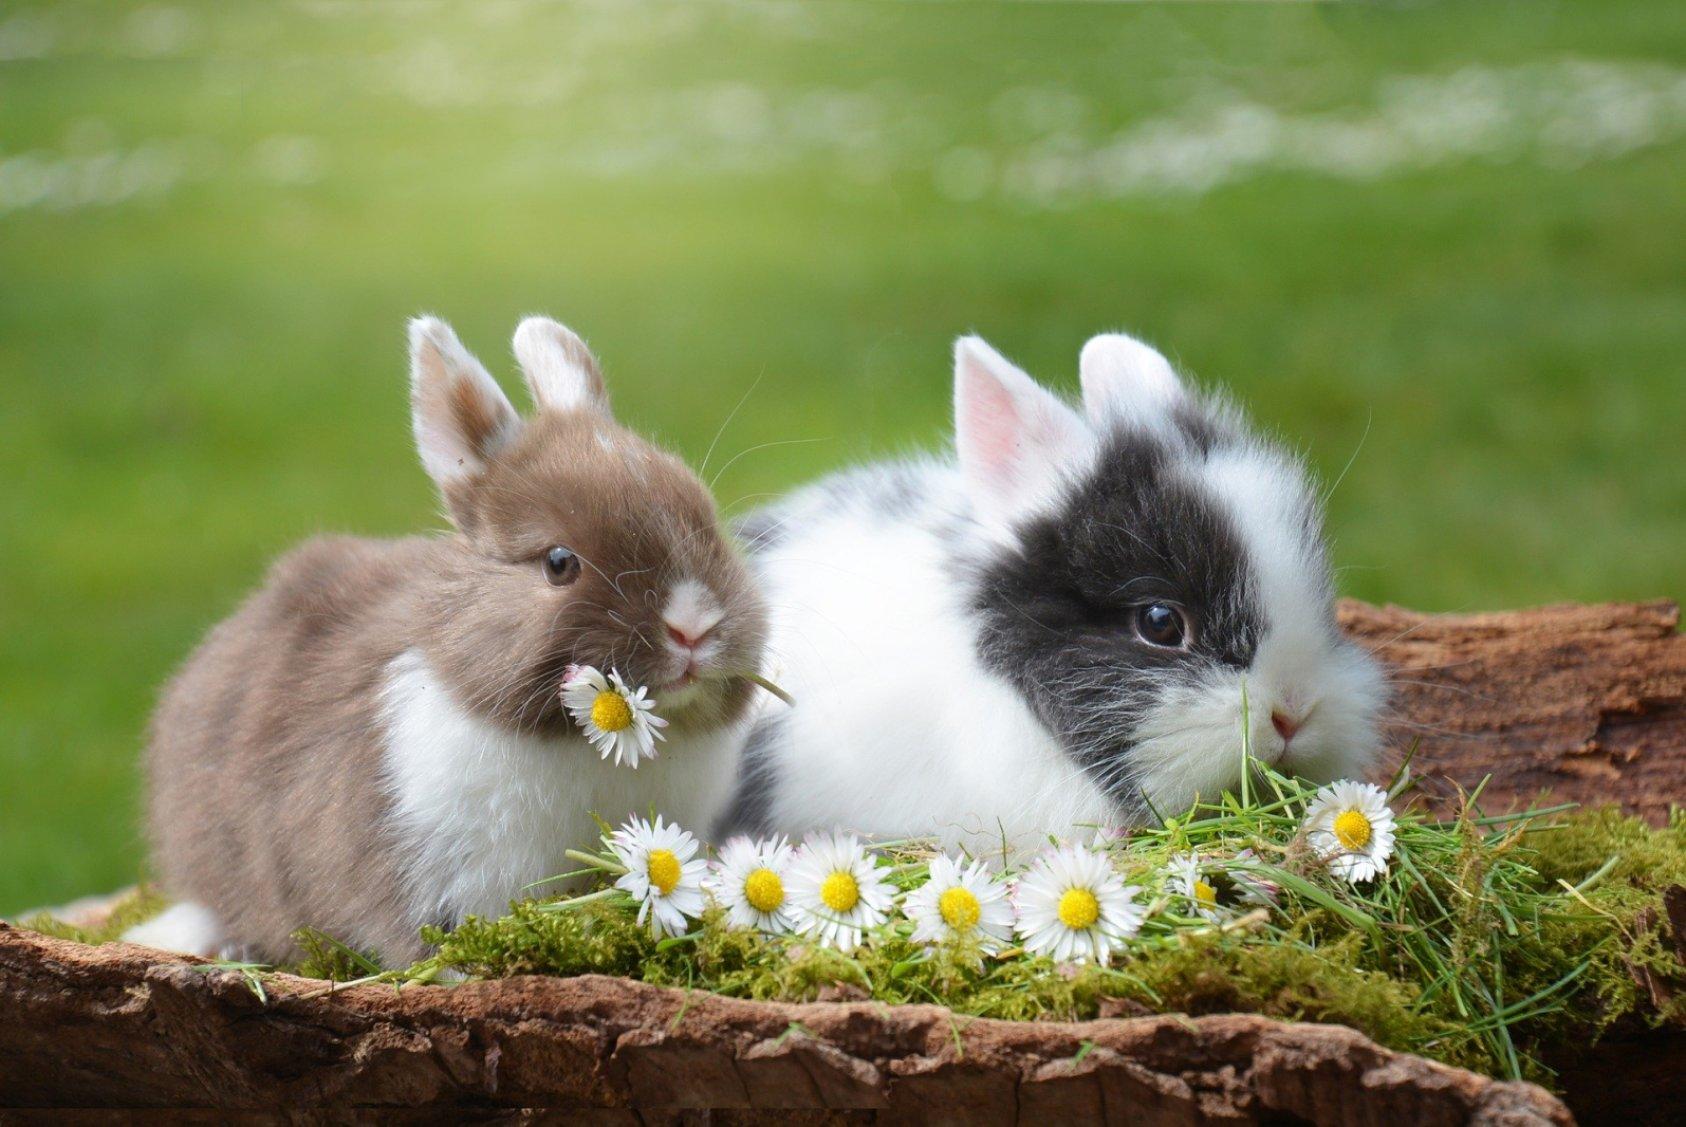 Two Little Bunnies - Original image